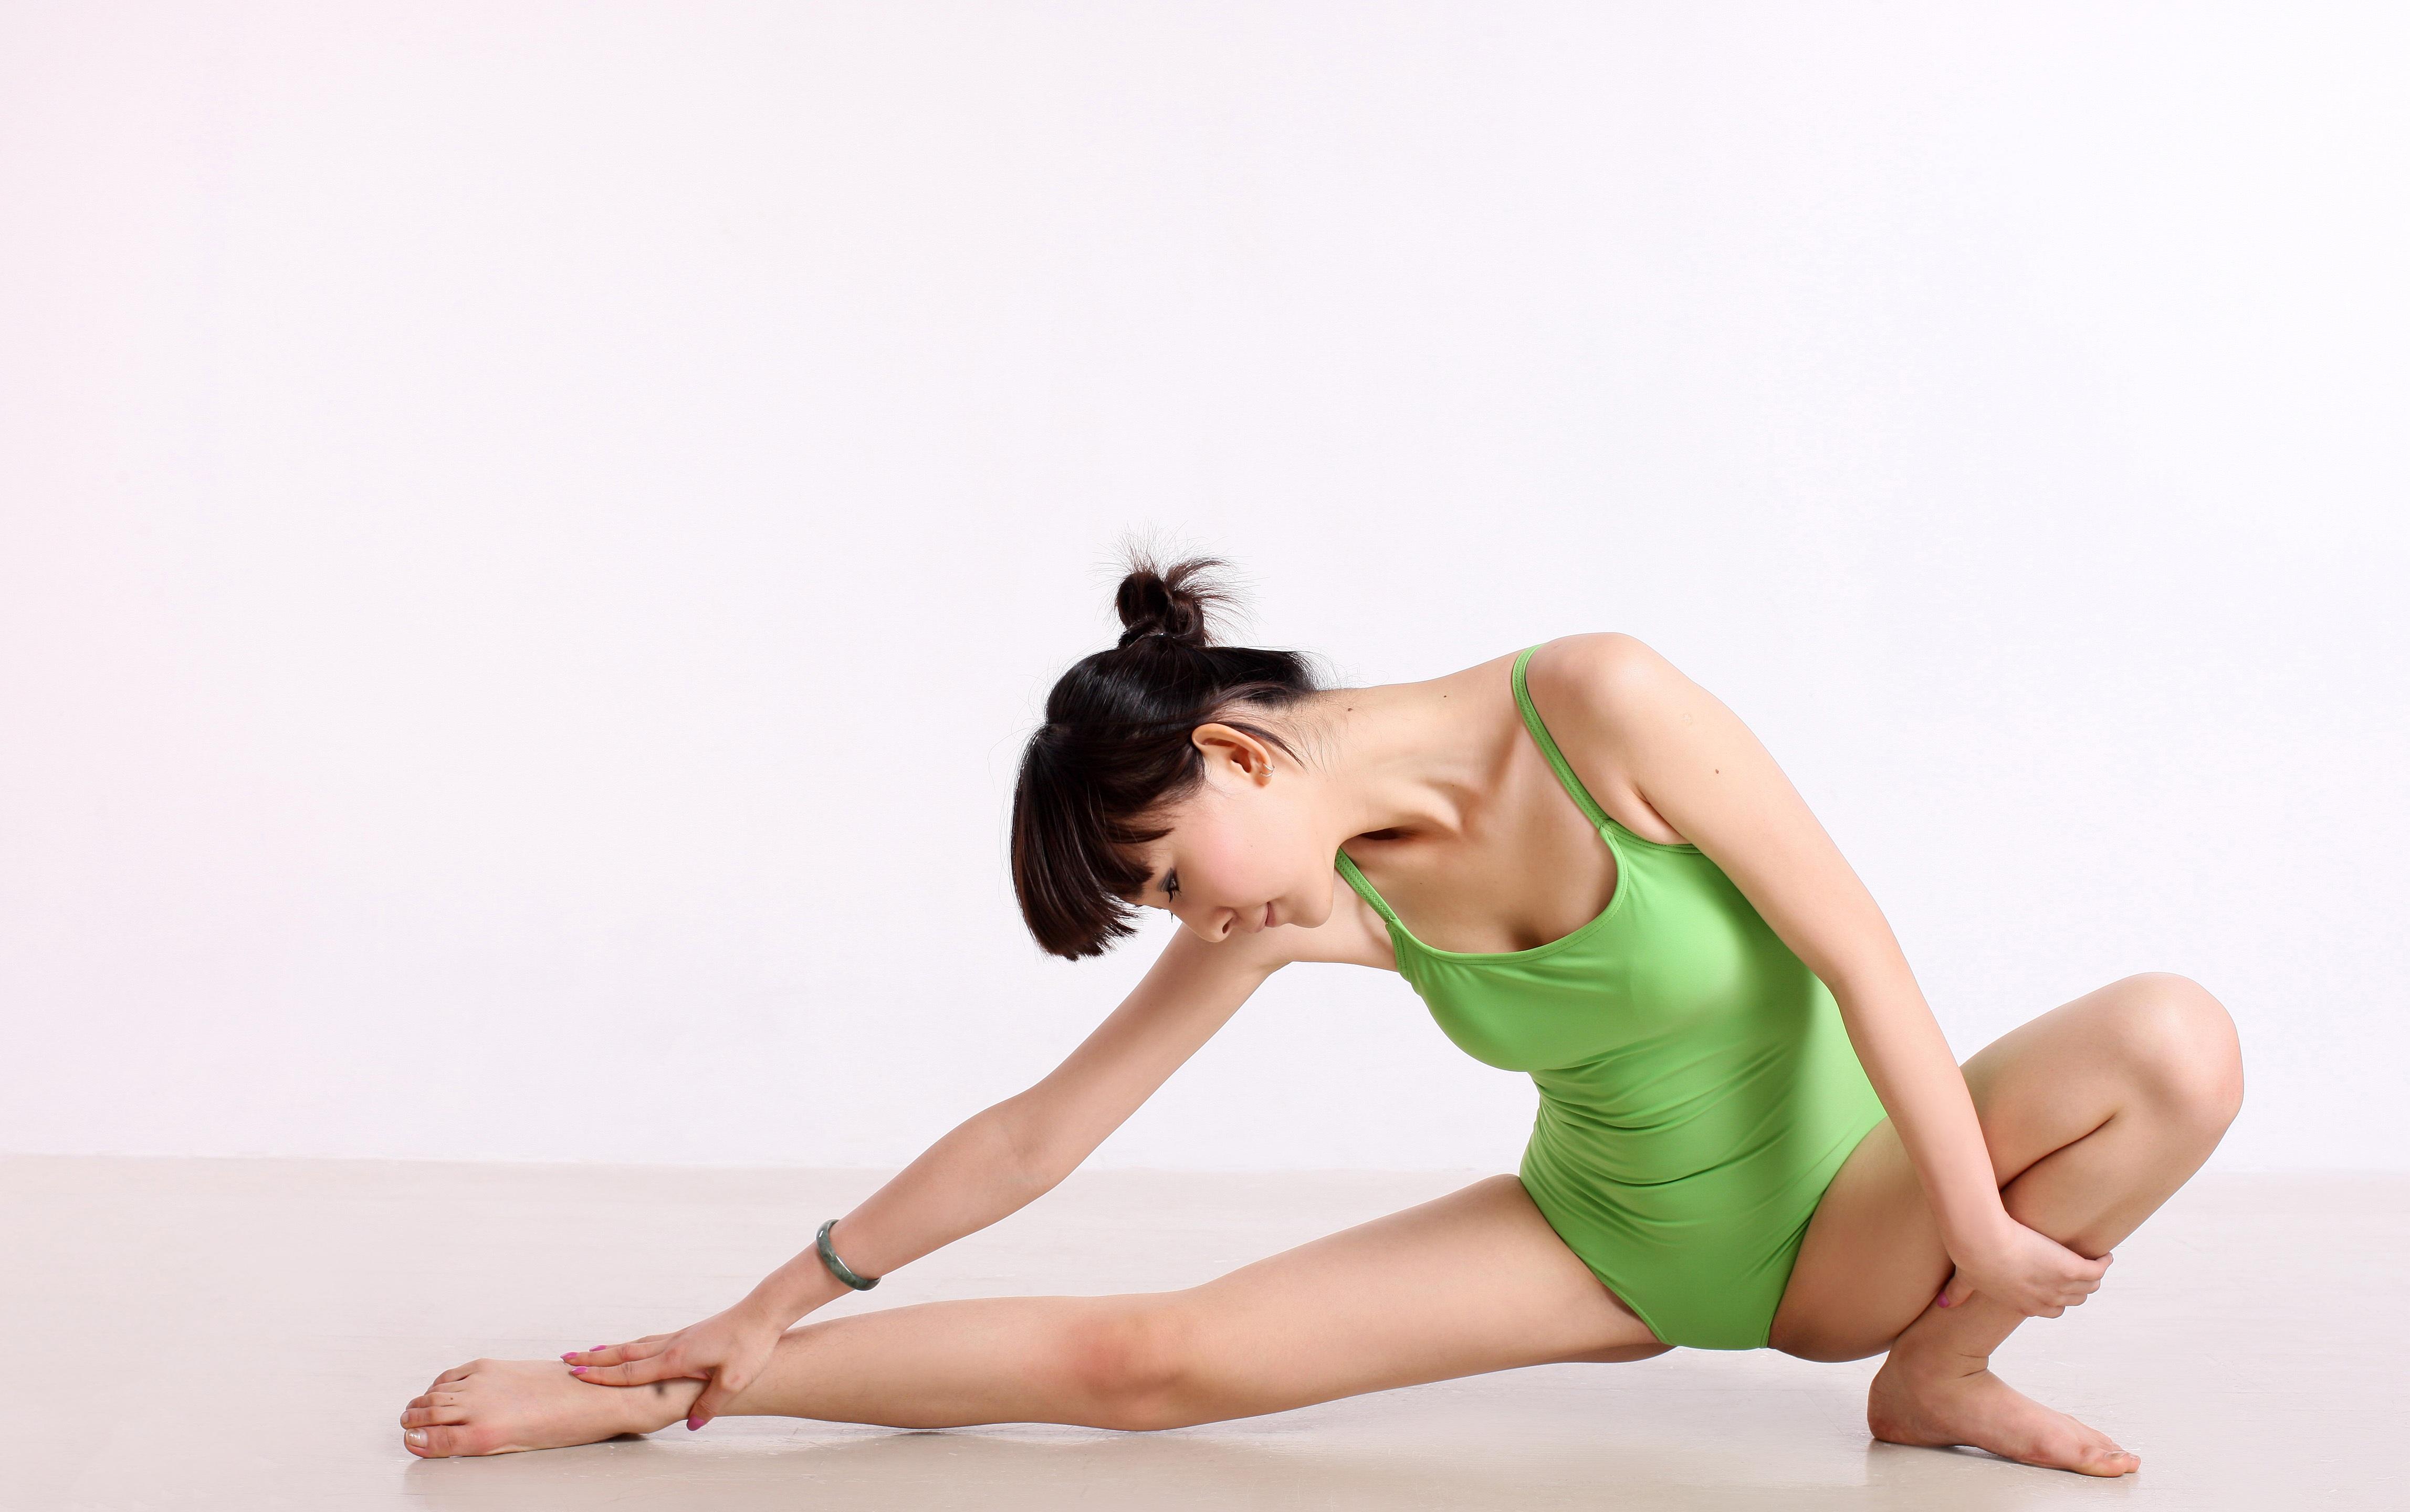 Fotos gratis : hembra, pierna, baile, sentado, brazo, músculo, pecho ...